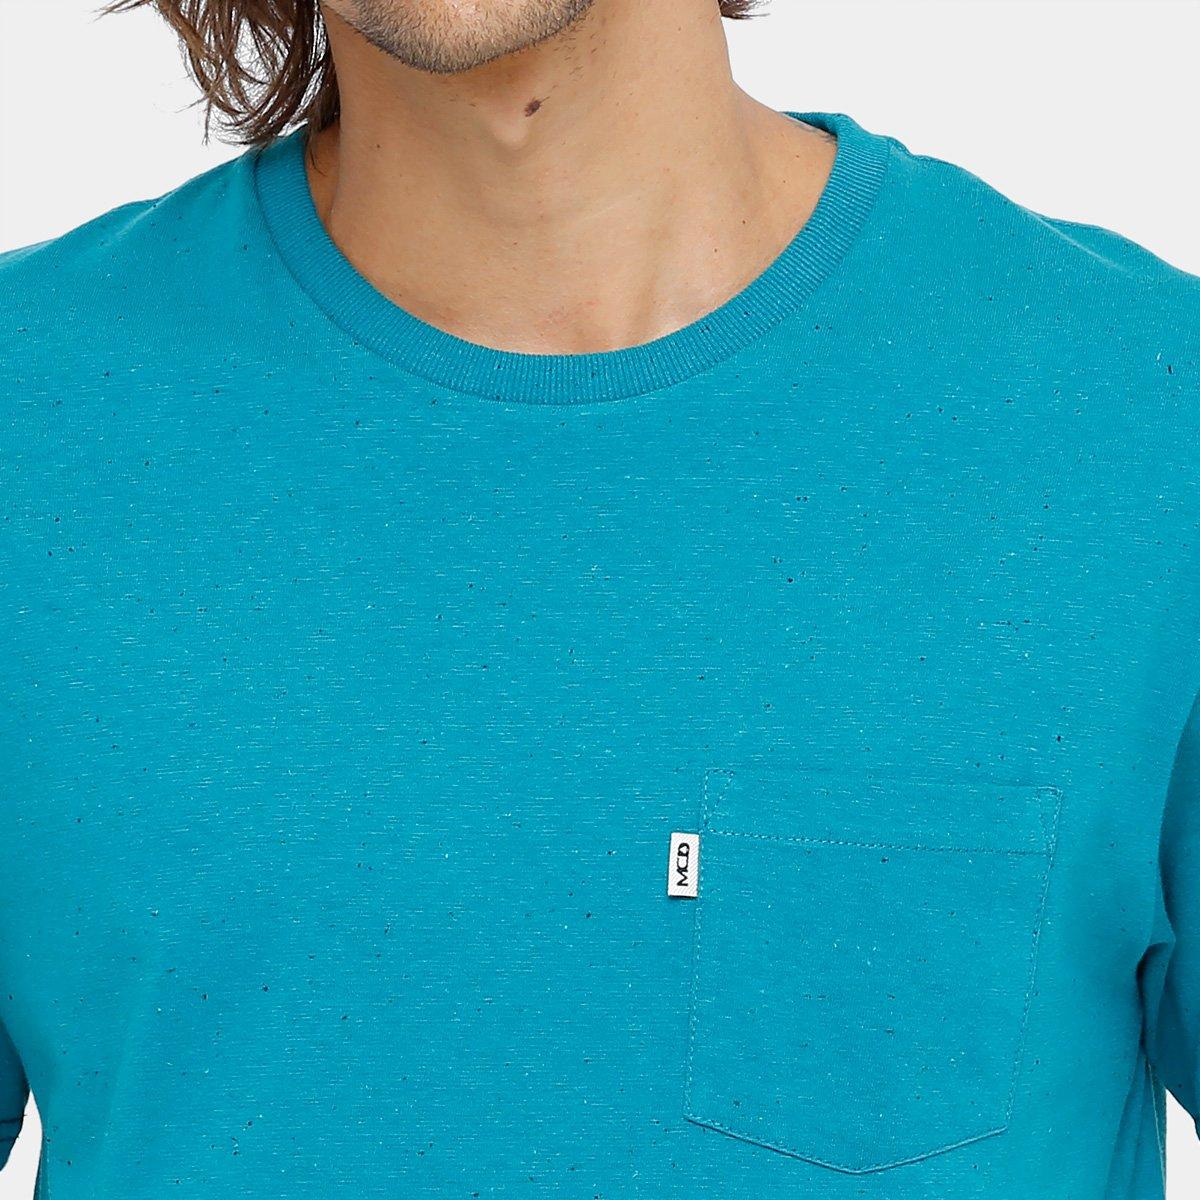 Camiseta MCD Especial 2 Masculina - Compre Agora  db30f9344f5